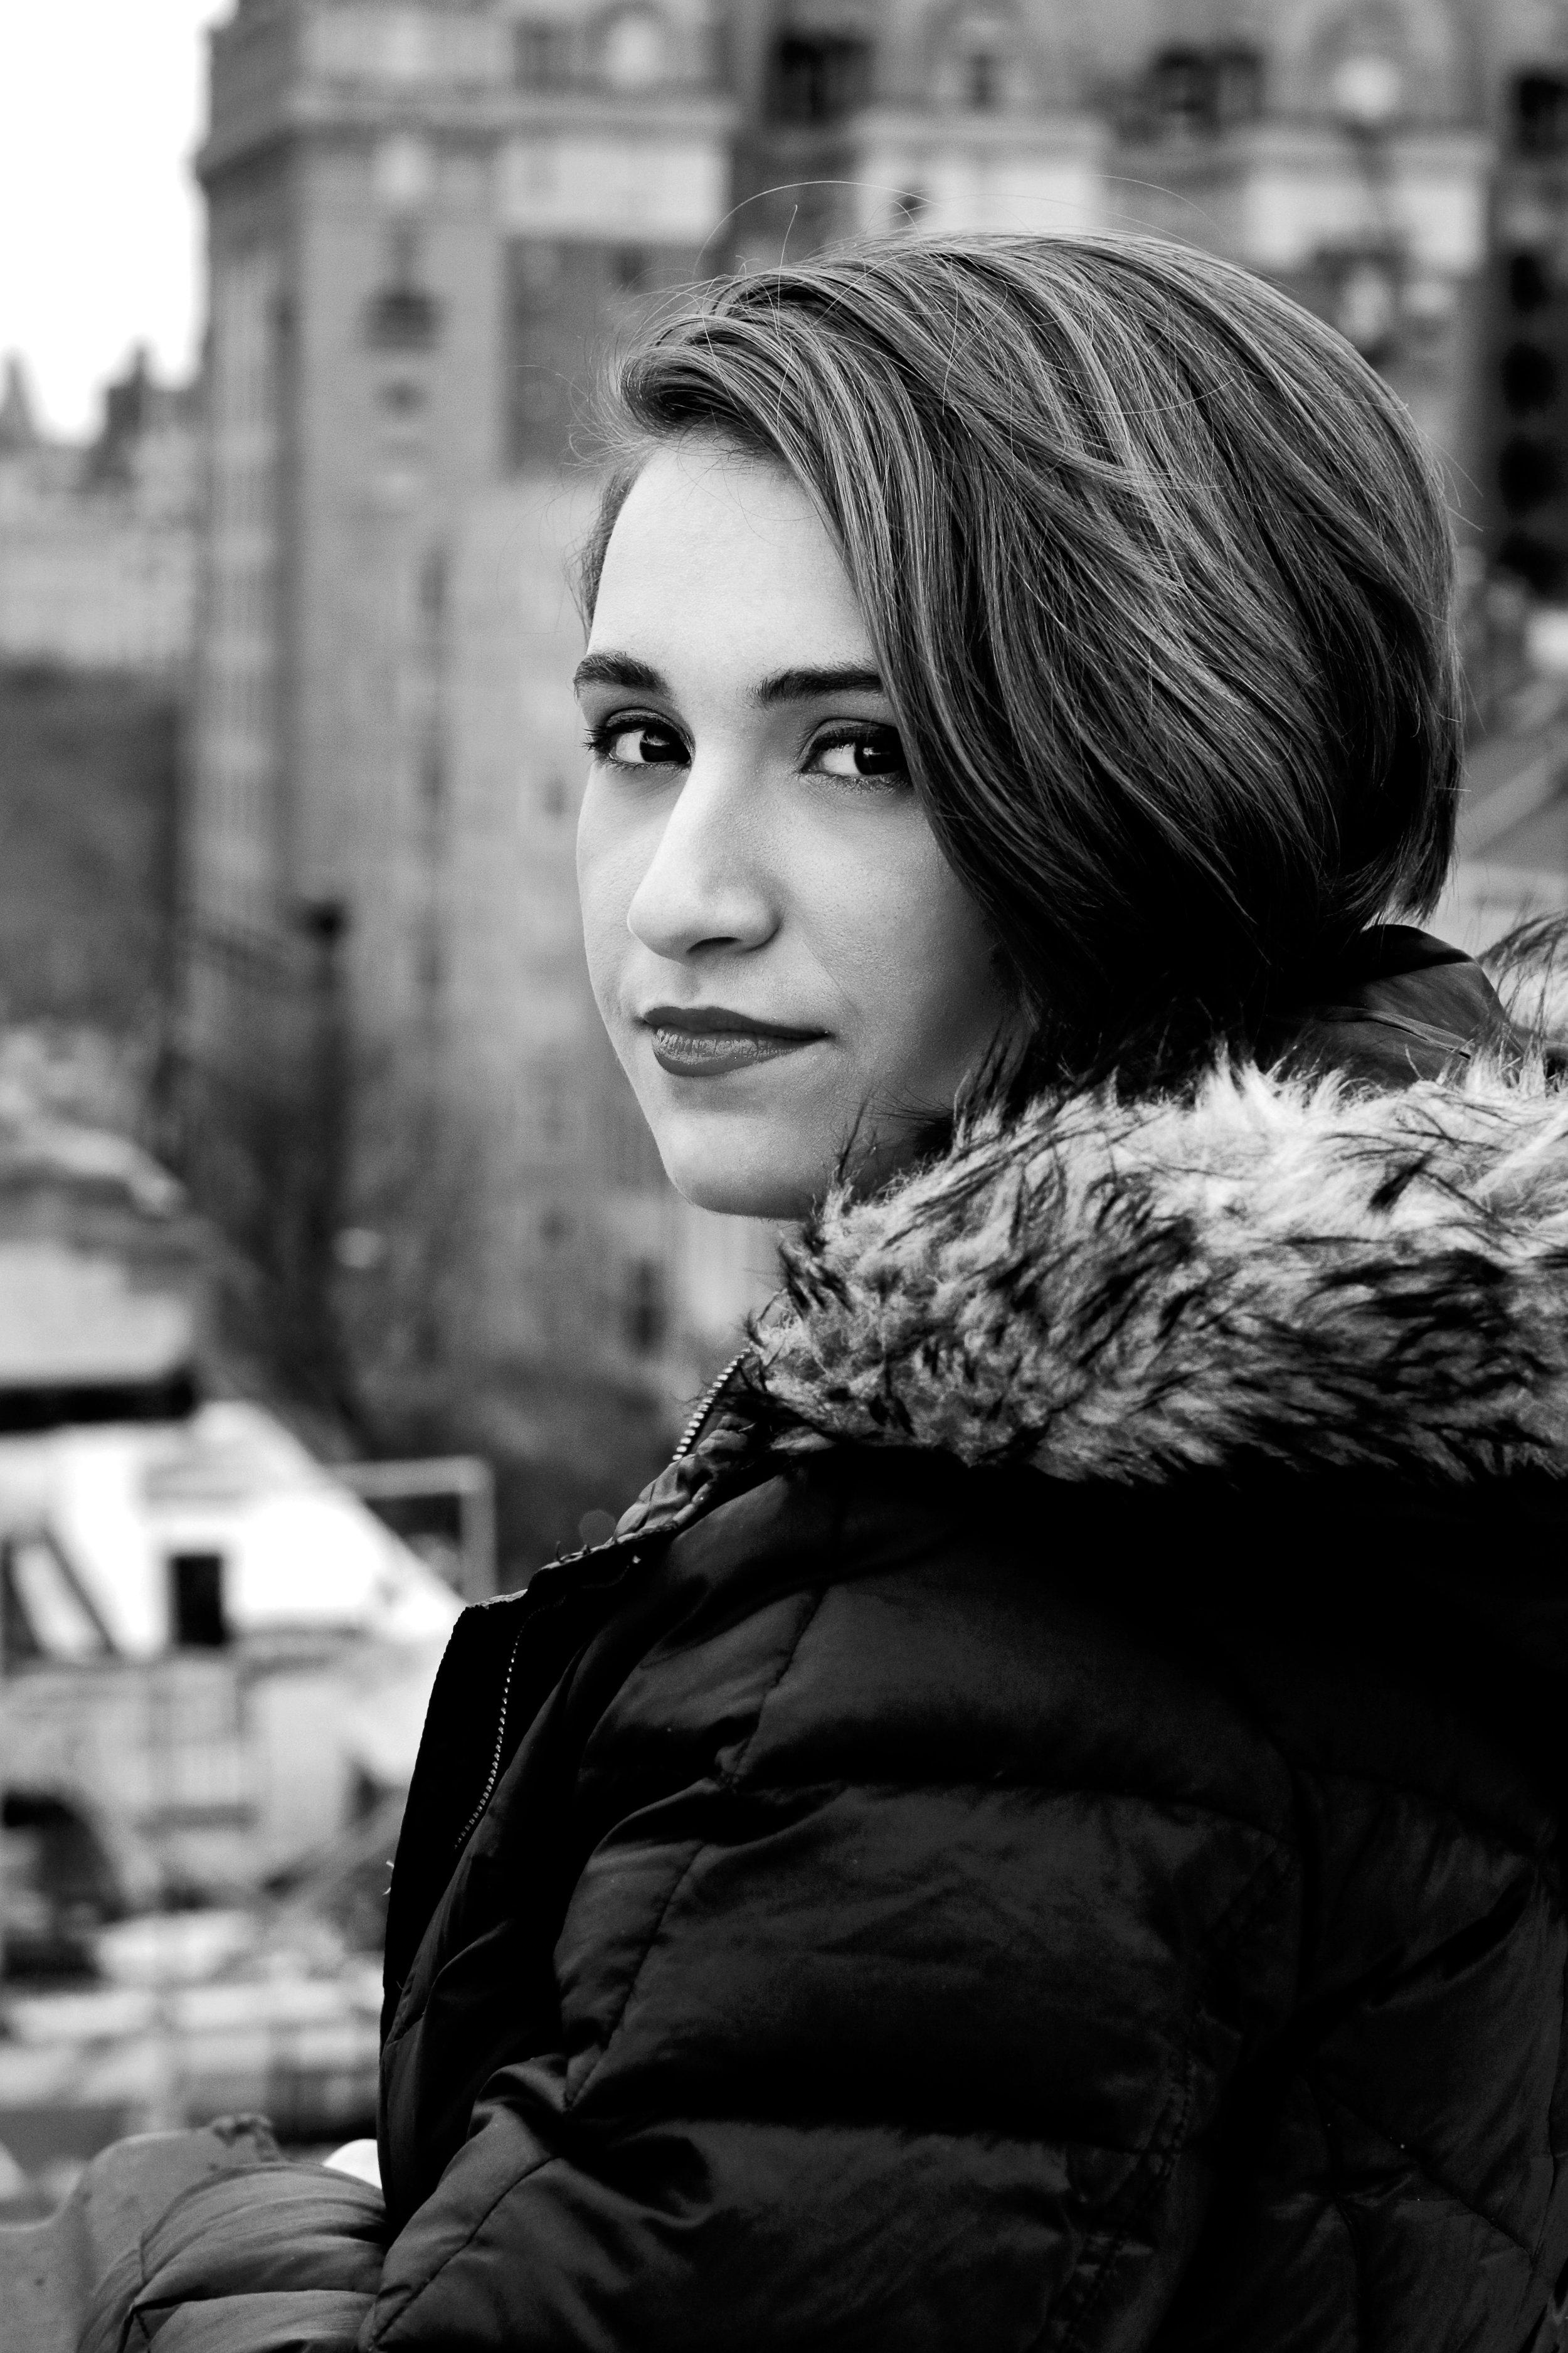 Portrait_MG_4180-2 WITH catchlight.jpg